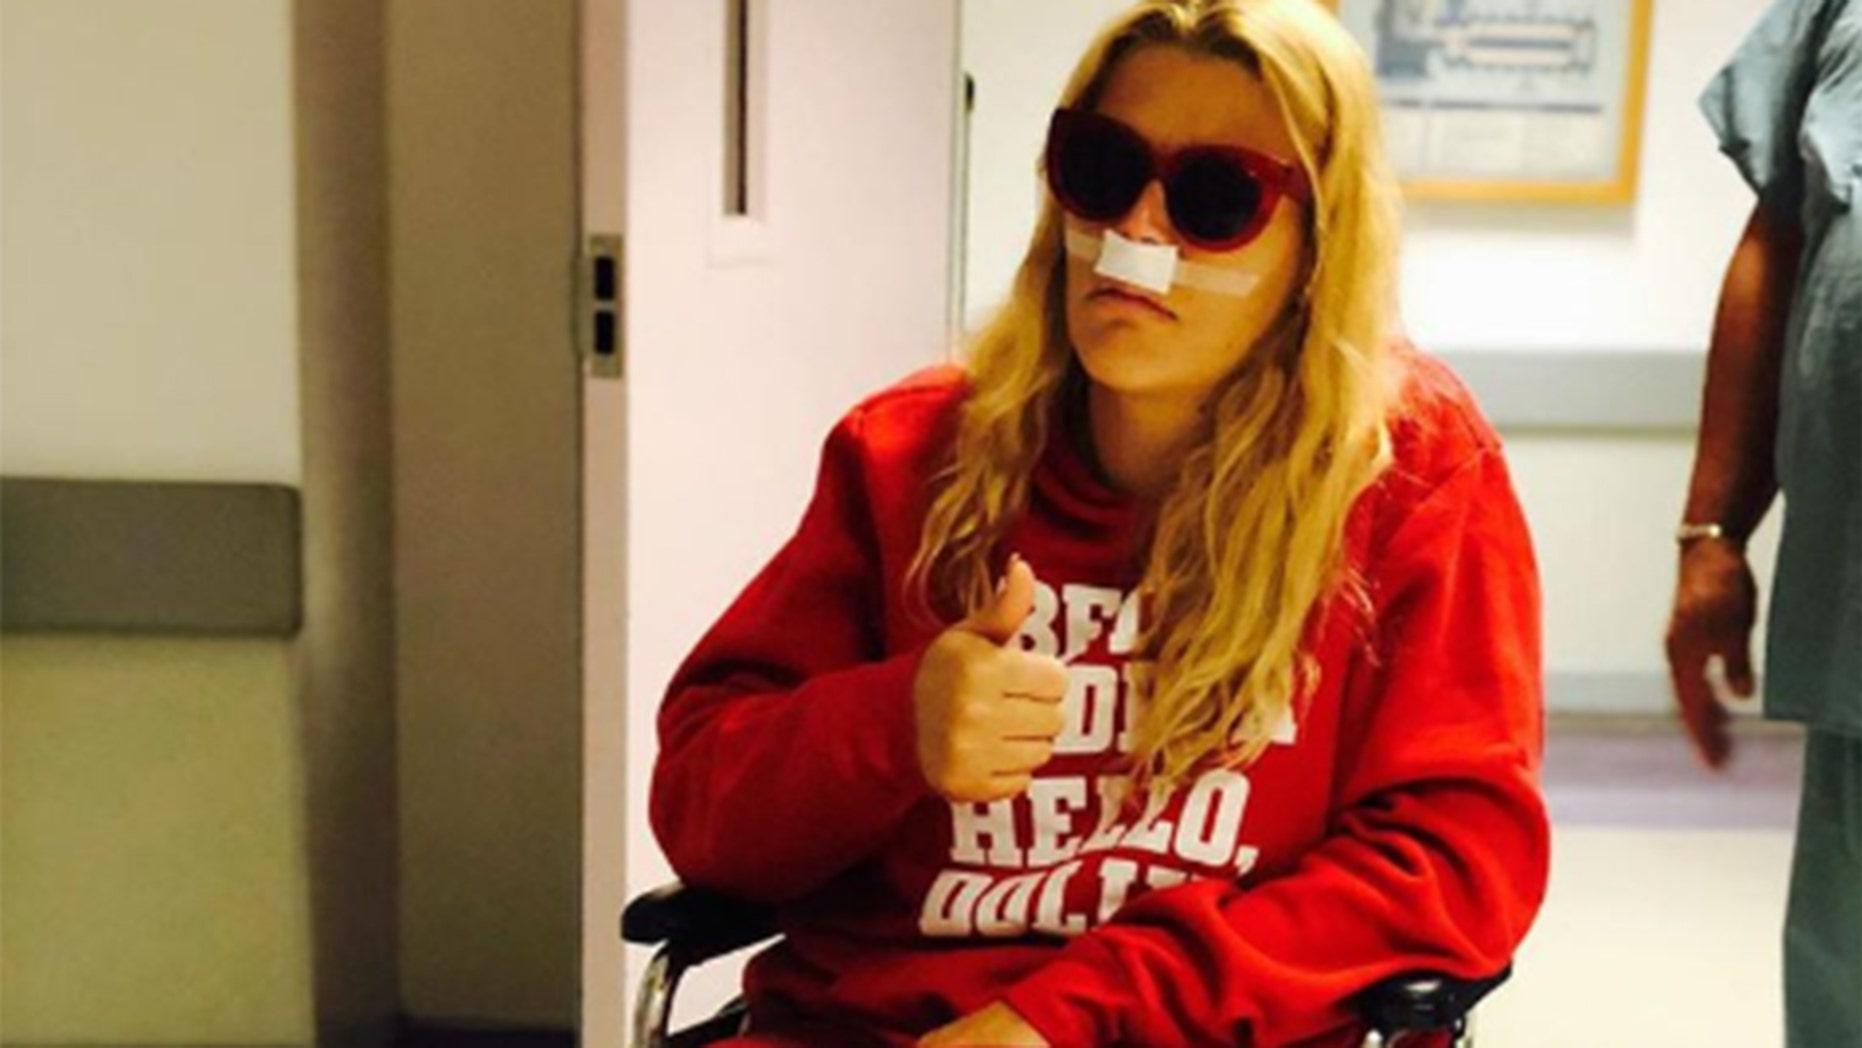 Busy Philipps revealed she had sinus surgery on Sunday.